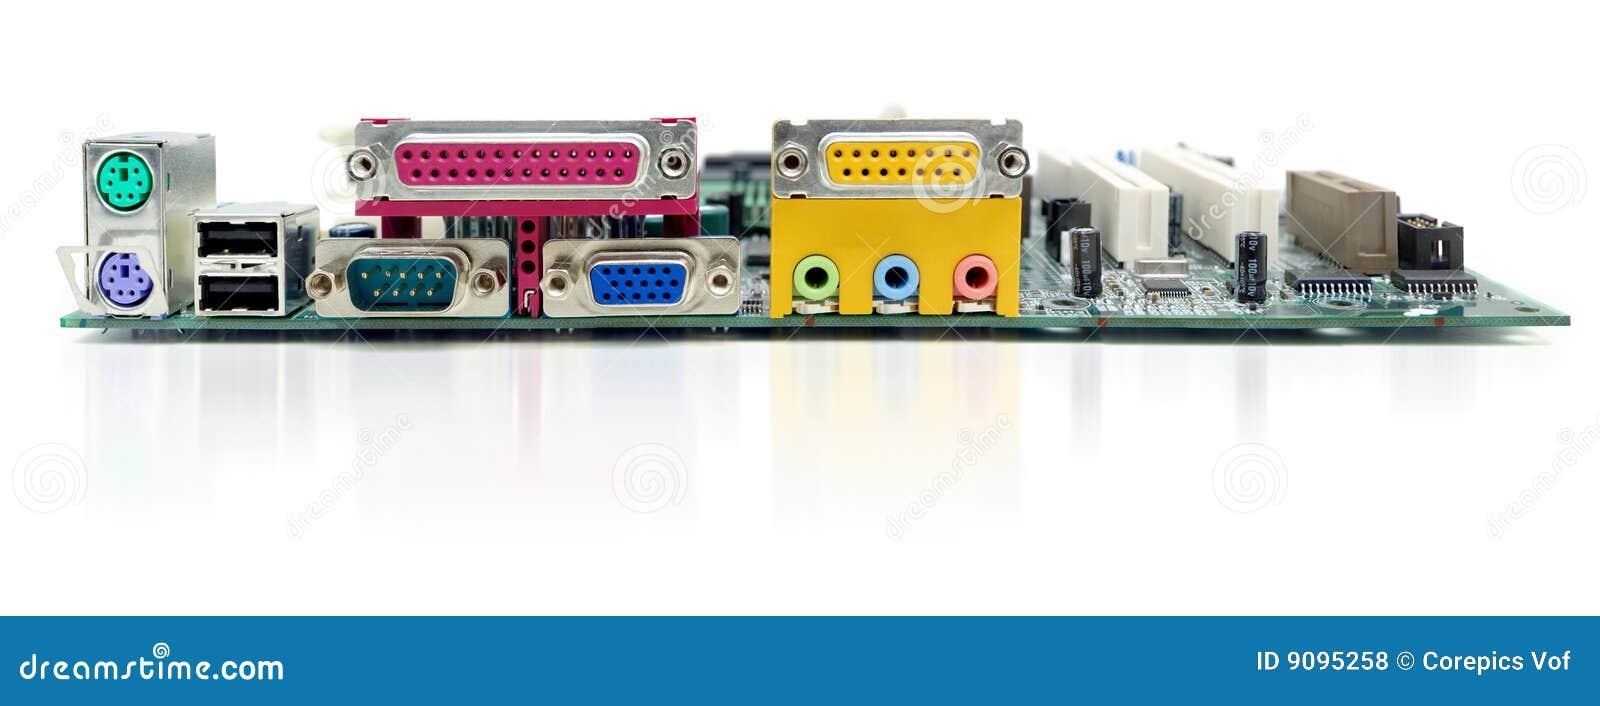 Motherboard xxl